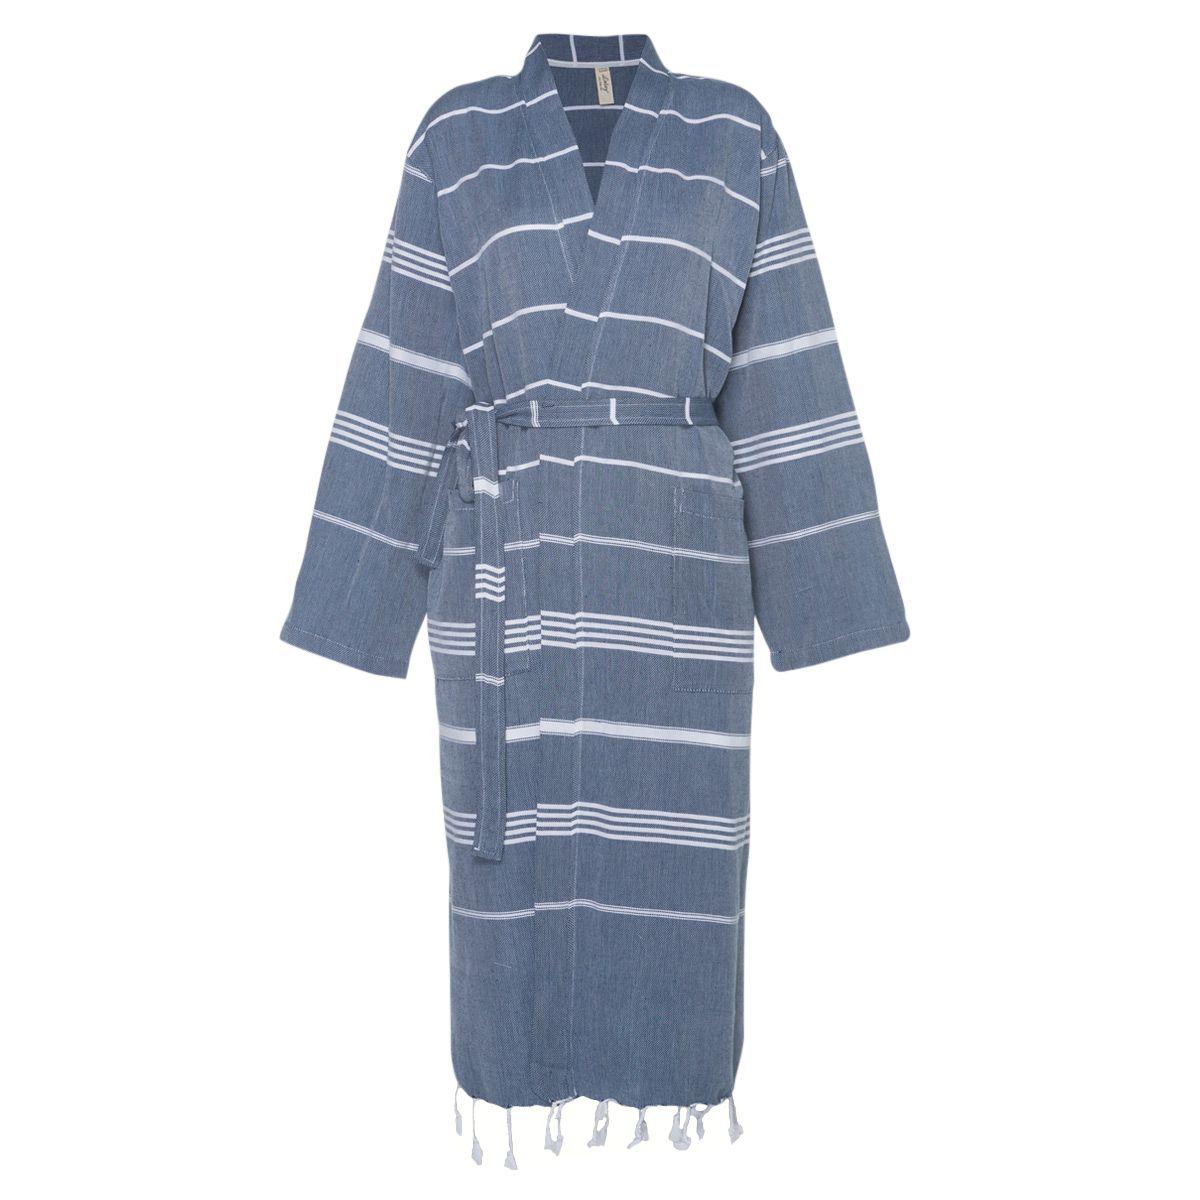 Bathrobe Leyla / Kimono Collar - Navy